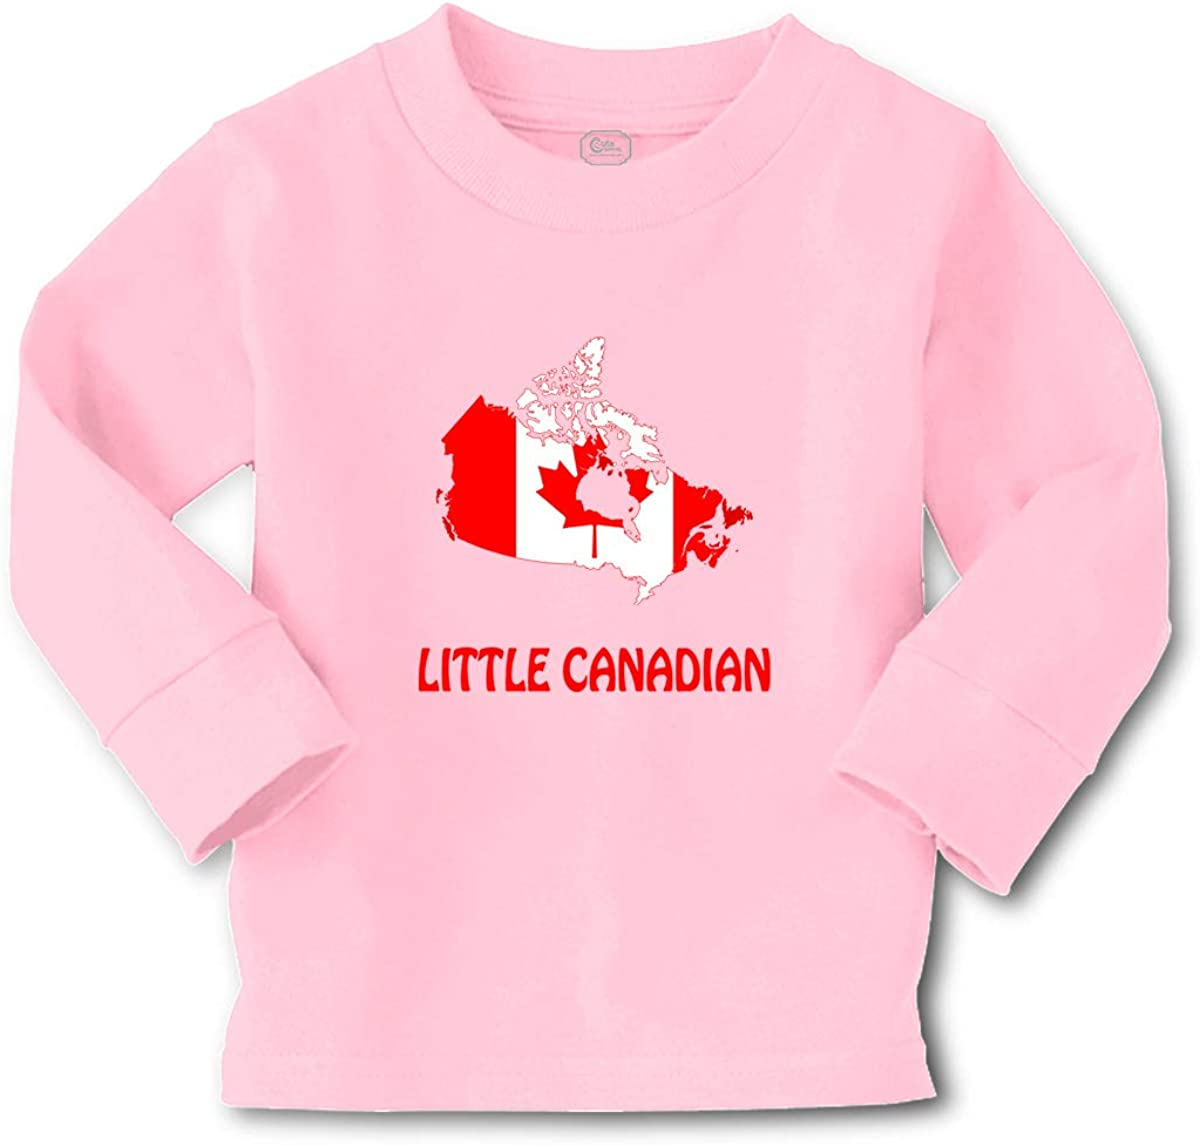 Cute Rascals Kids Long Sleeve T Shirt Little Canadian Countries Cotton Boy & Girl Clothes